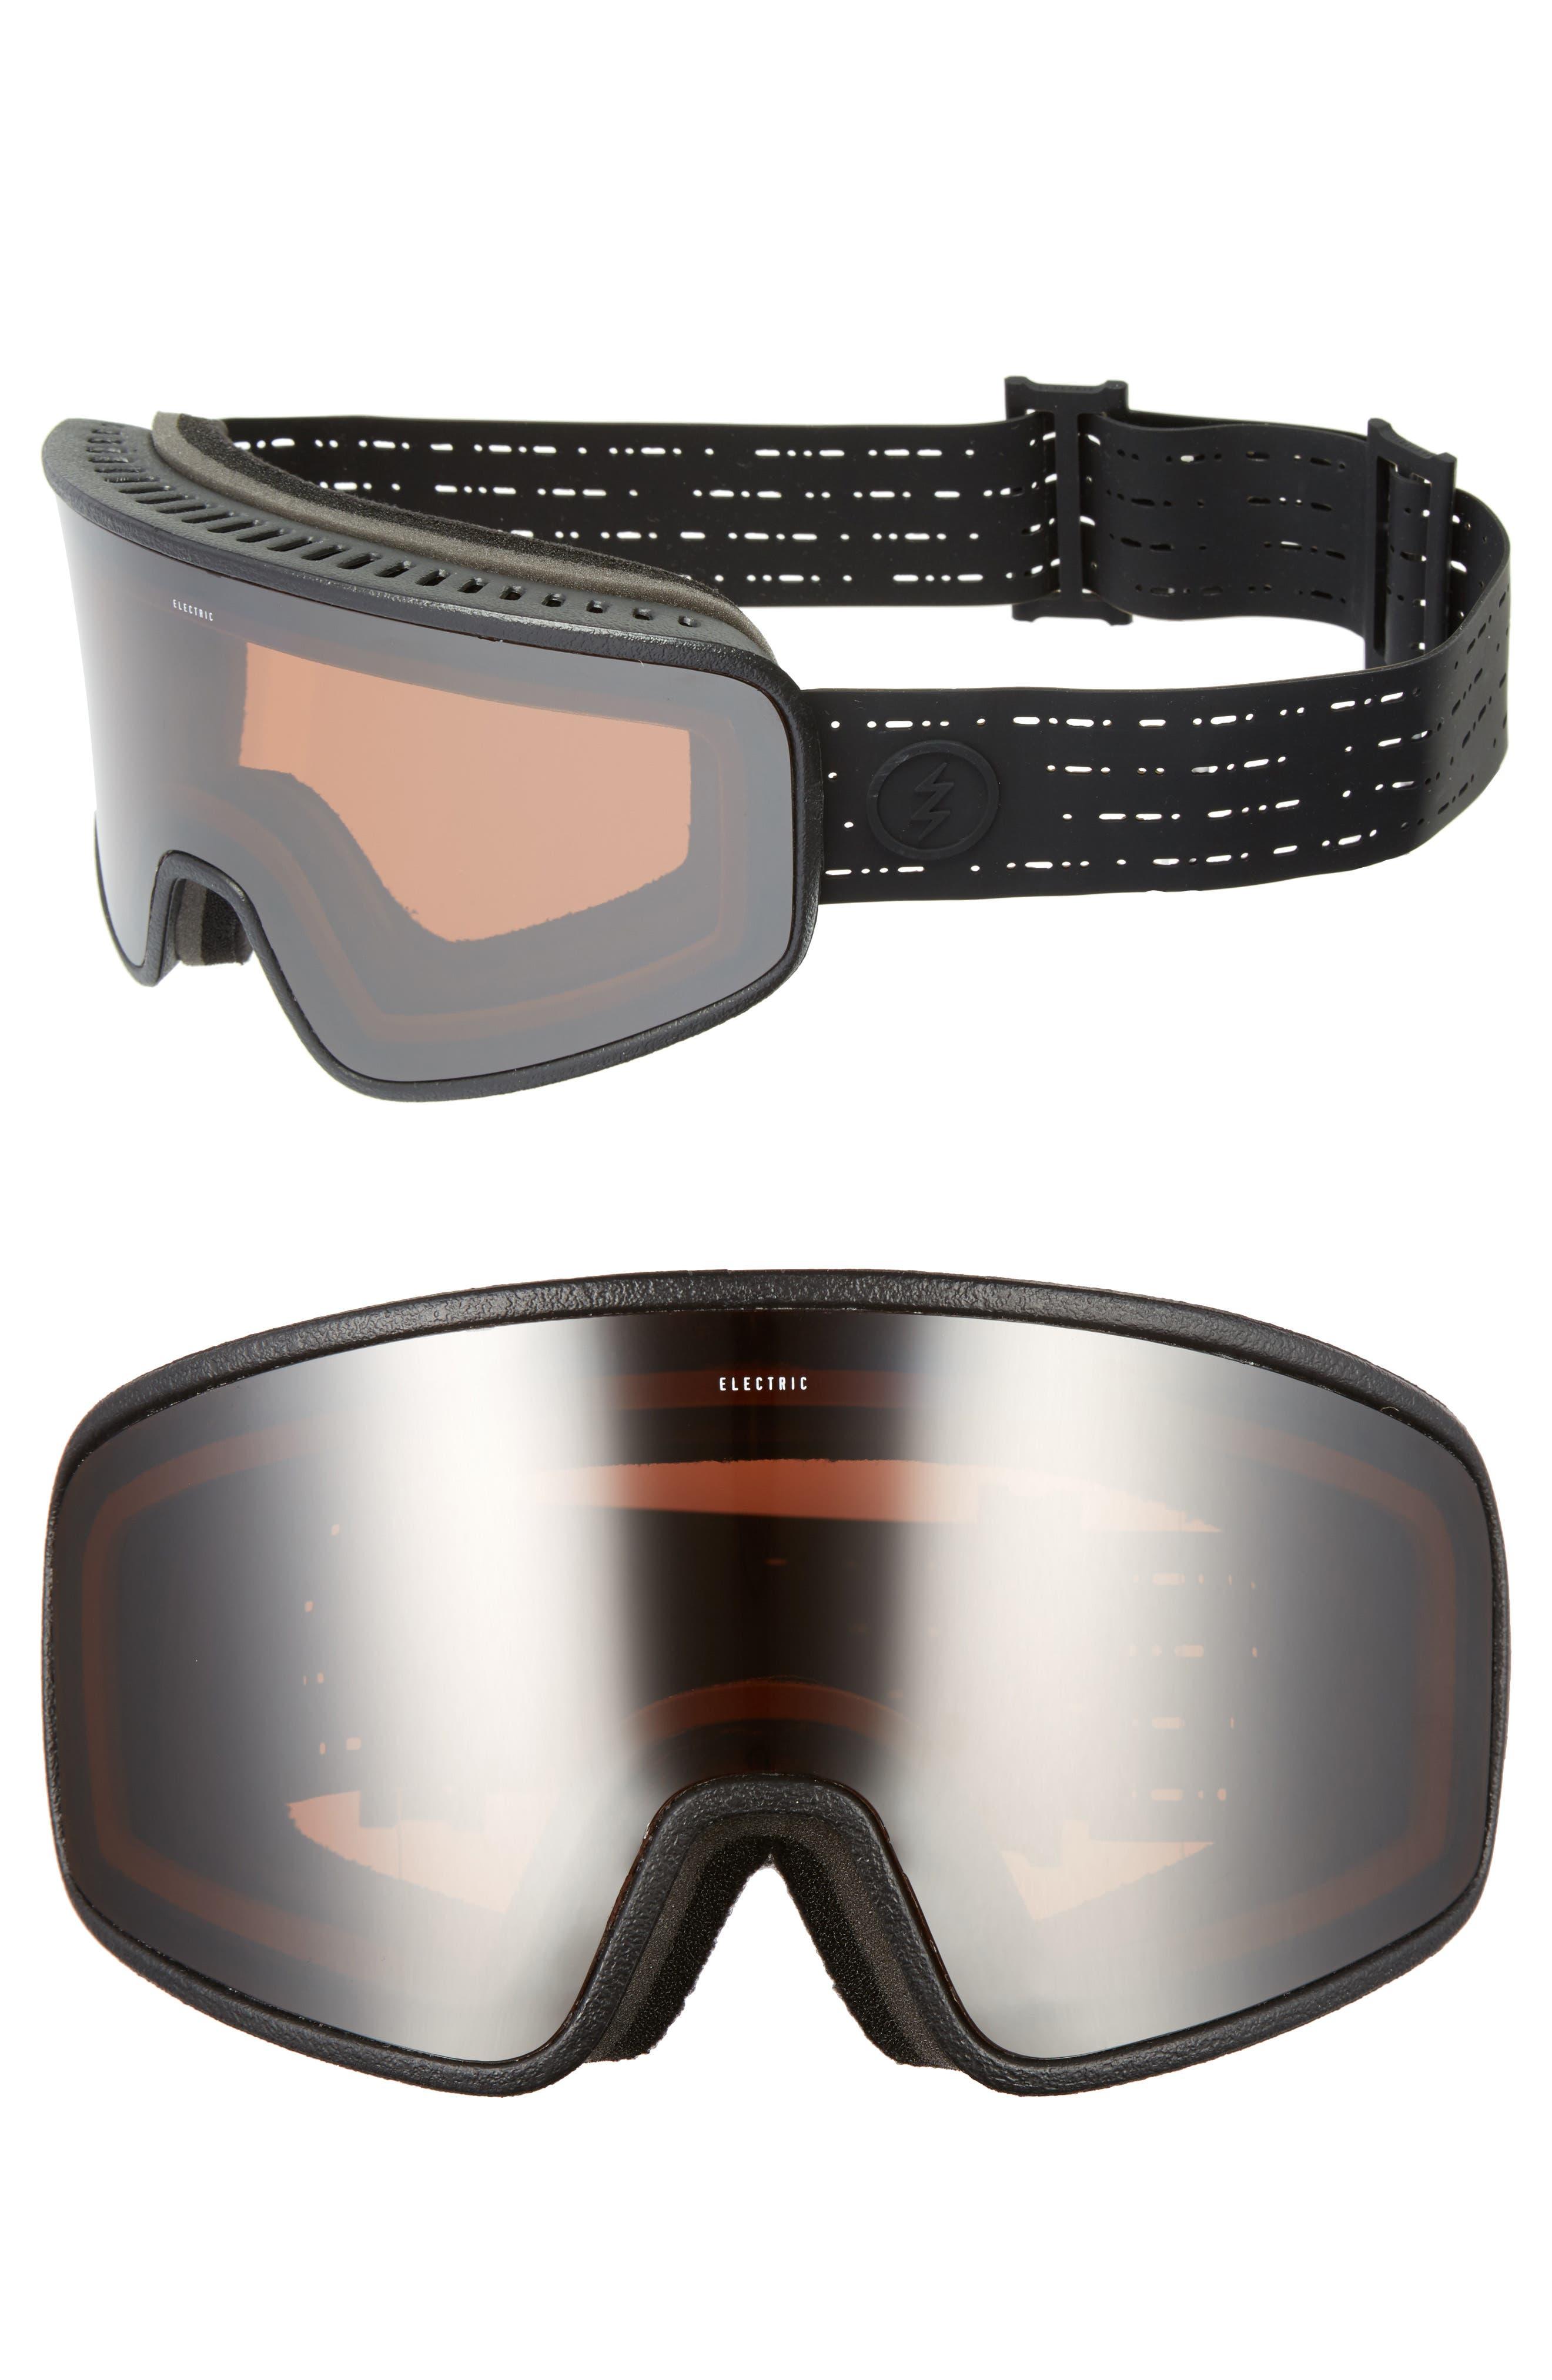 Electrolite 215mm Snow Goggles,                             Alternate thumbnail 2, color,                             002